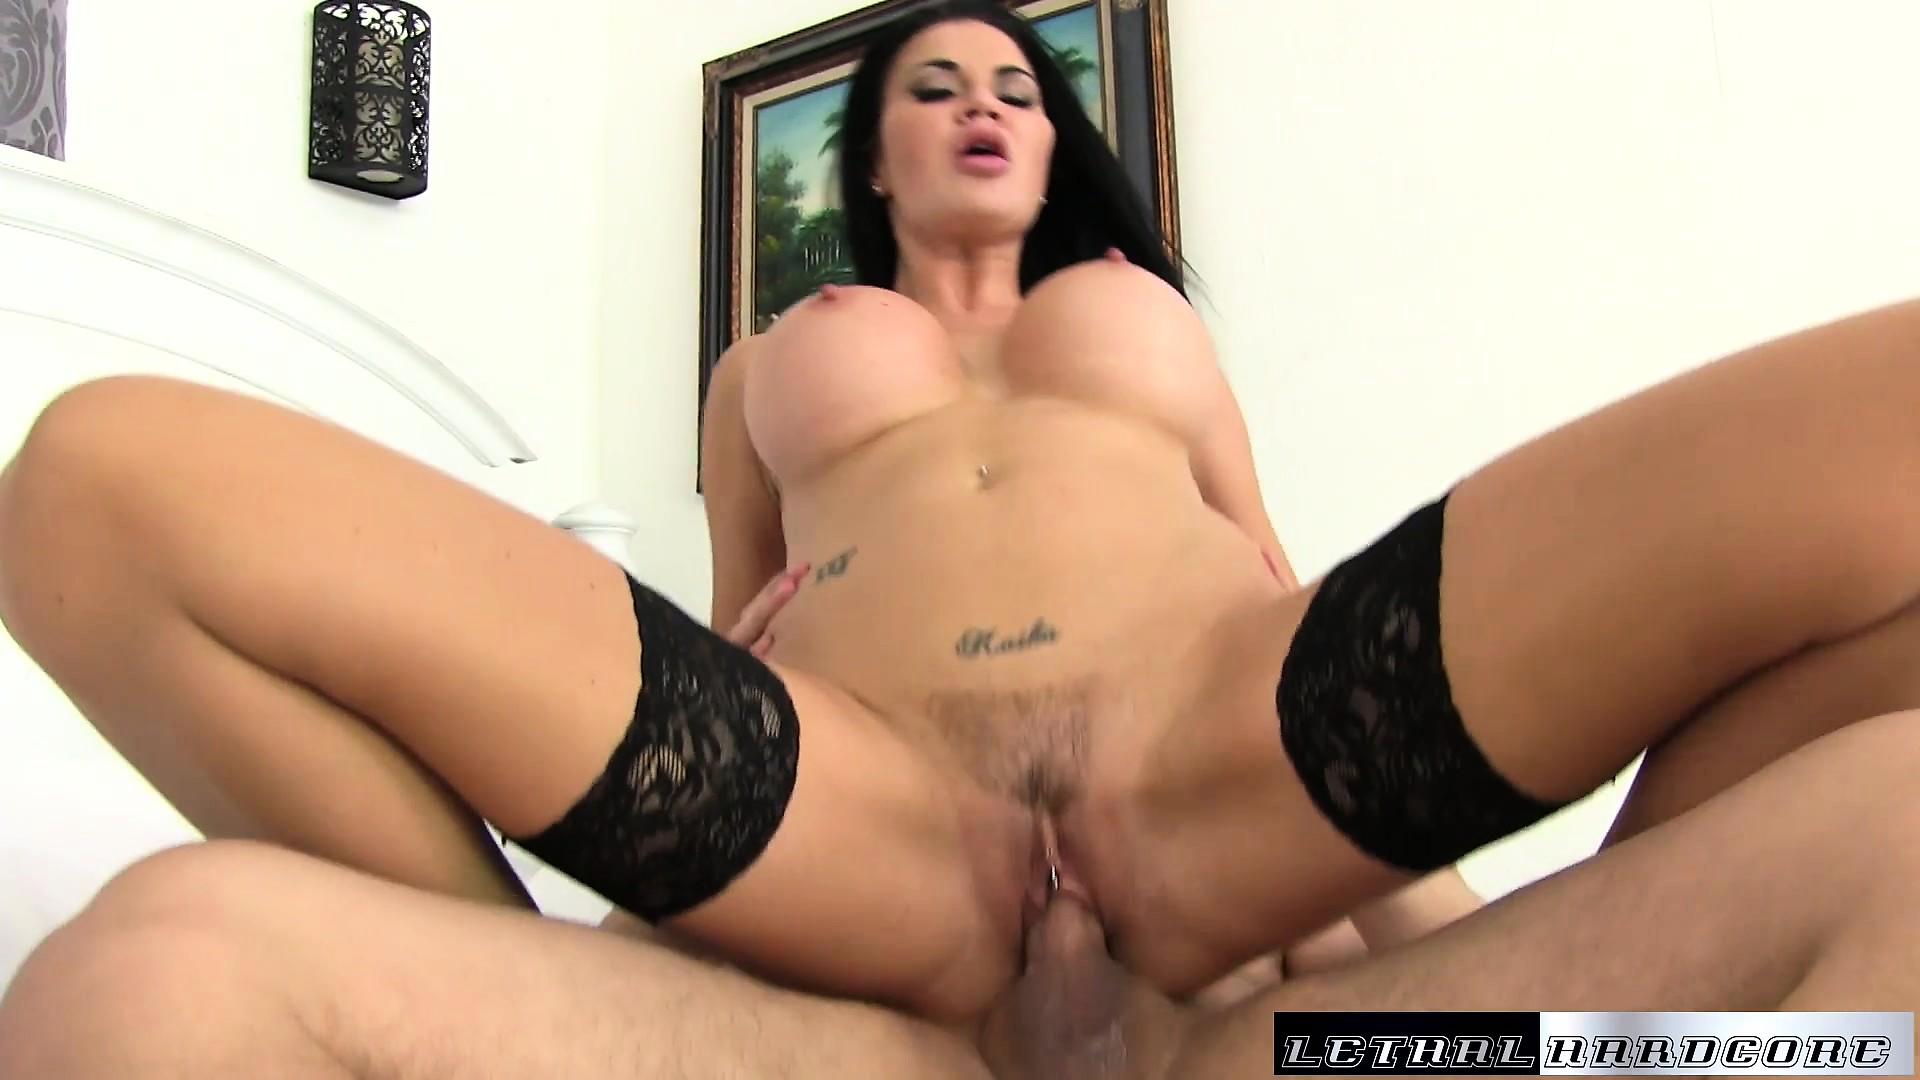 hot milf sex vidoes stor pussy nøgen pige